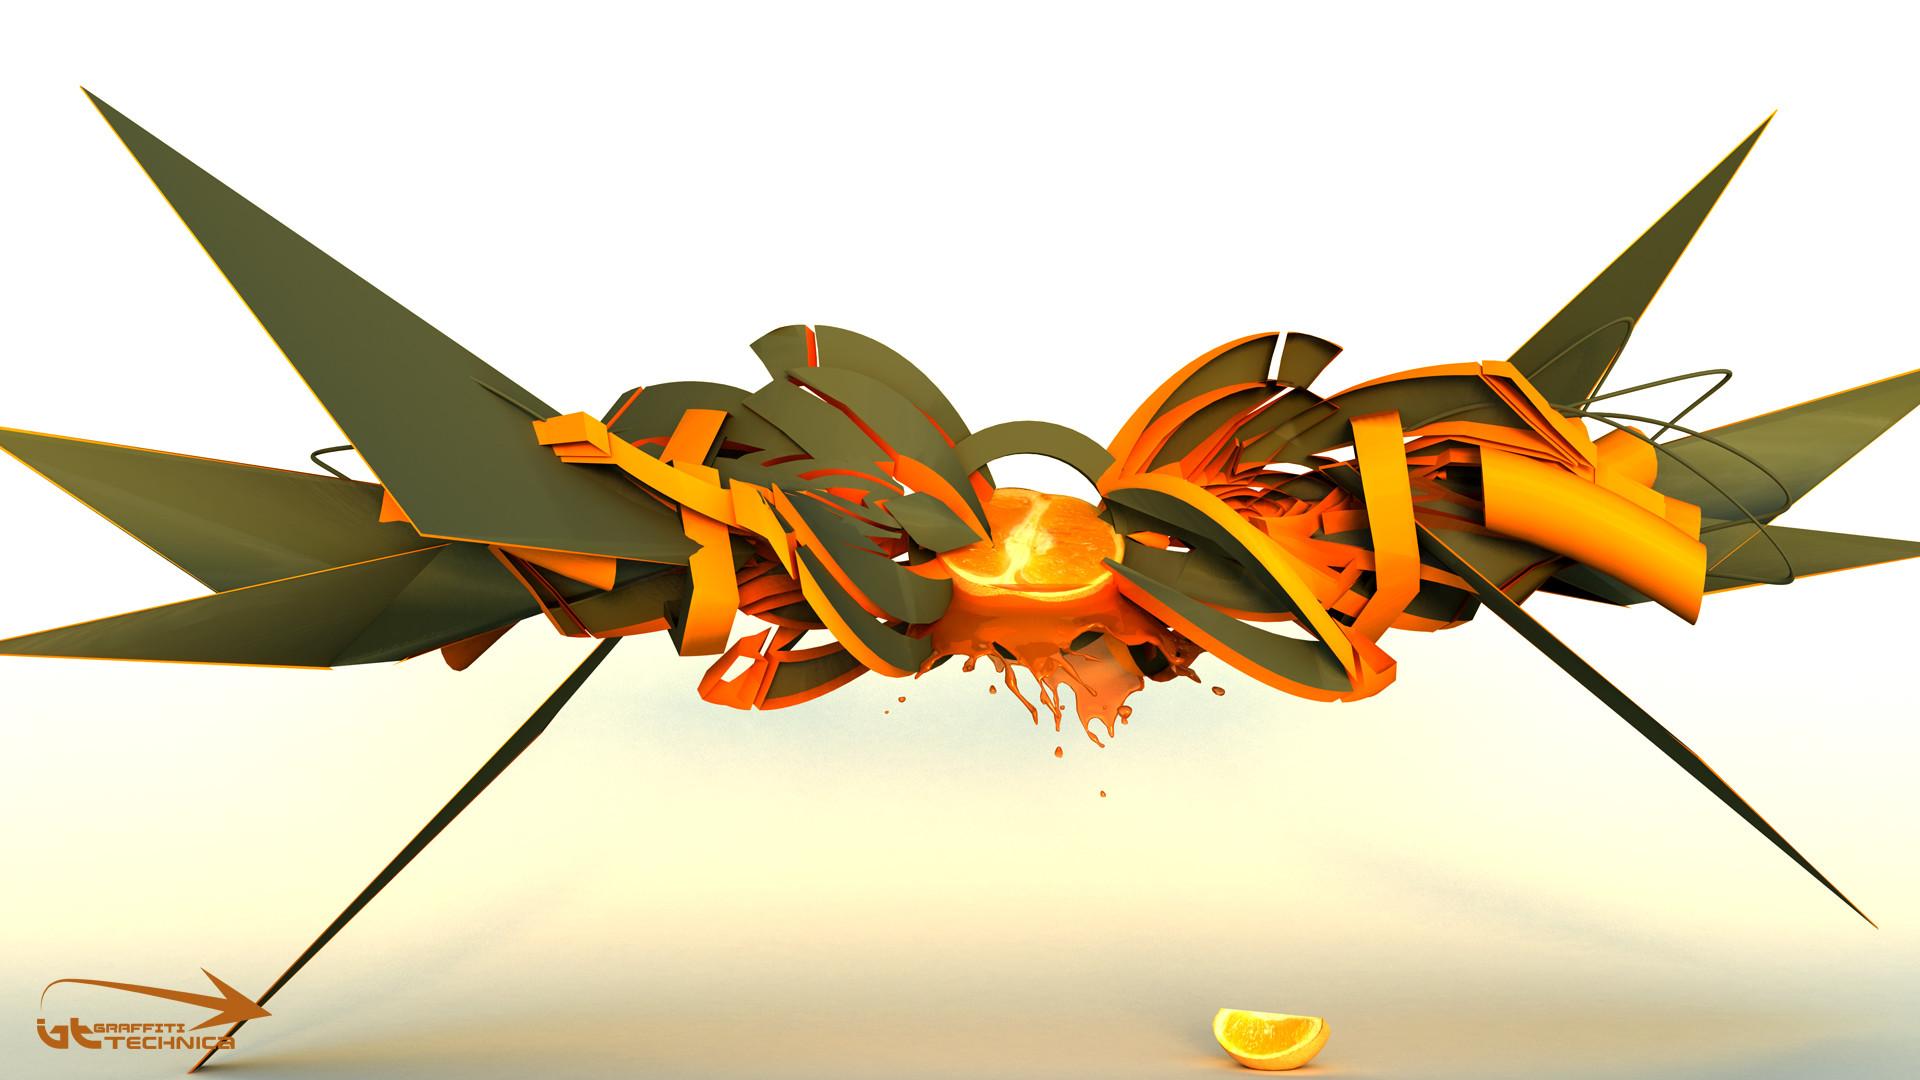 3d graffiti wallpaper – Orange fruit graffiti